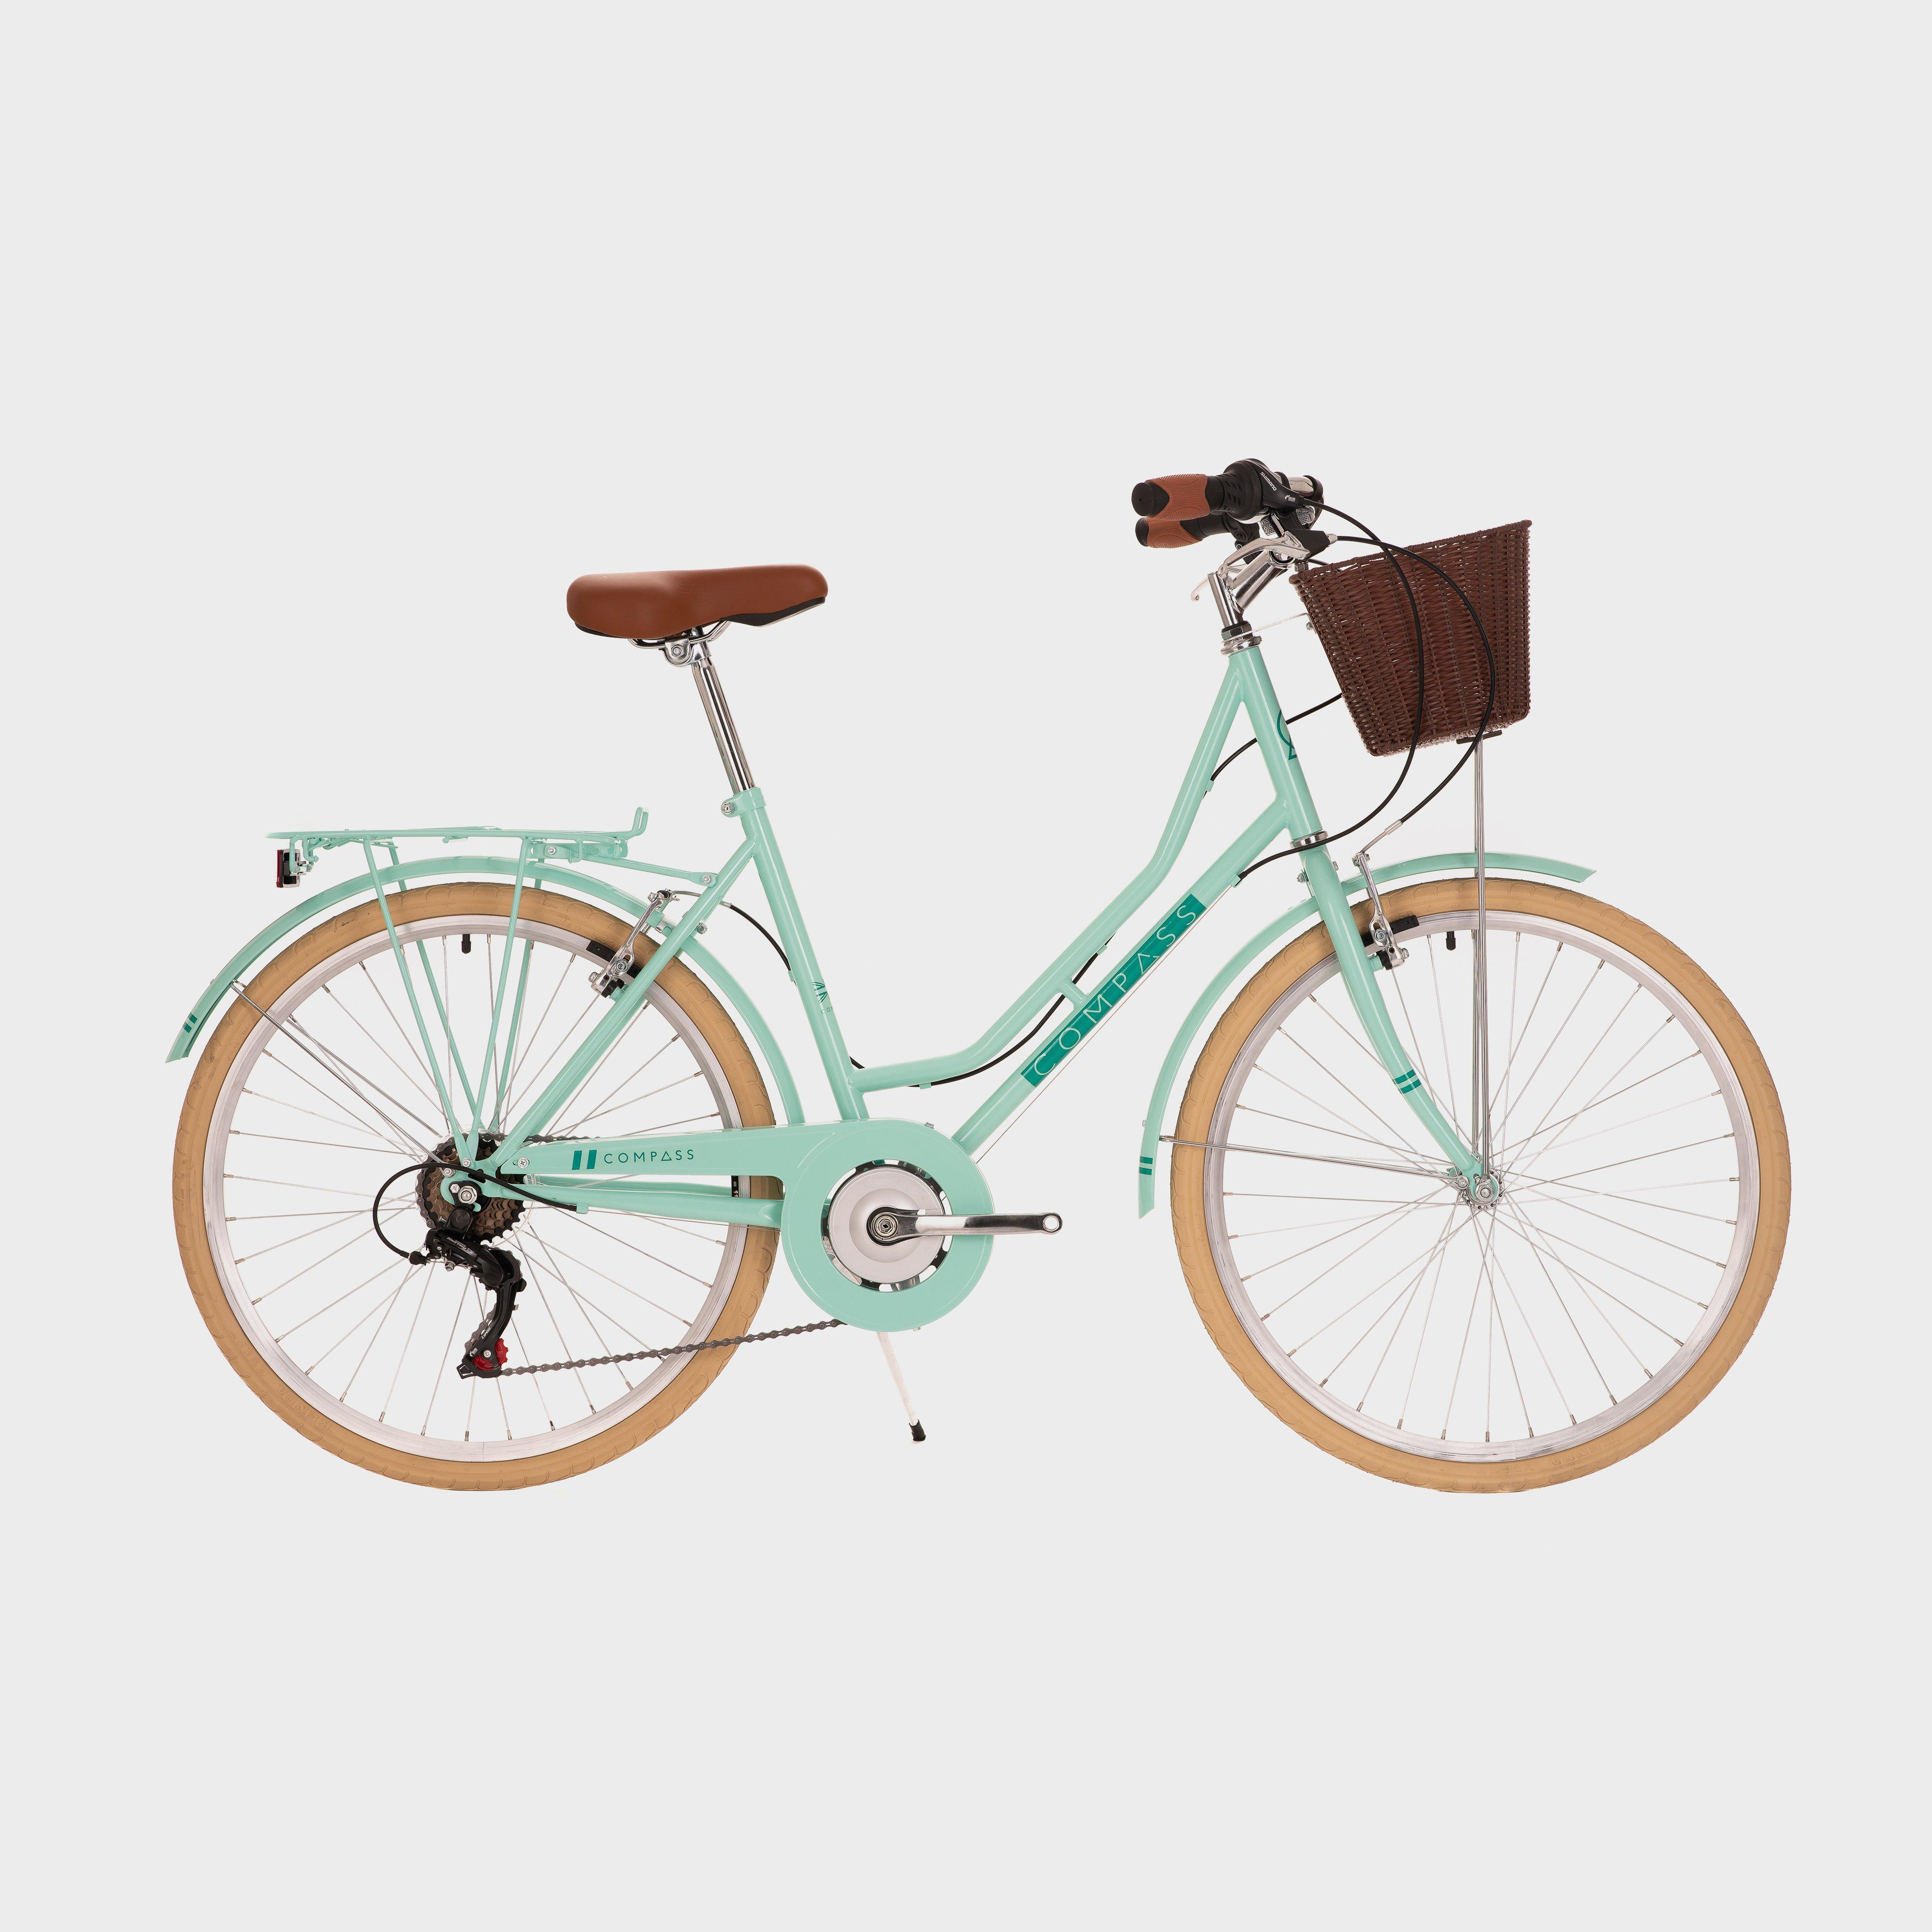 Compass Classic Women's Hybrid Bike, TEAL/CLASSIC